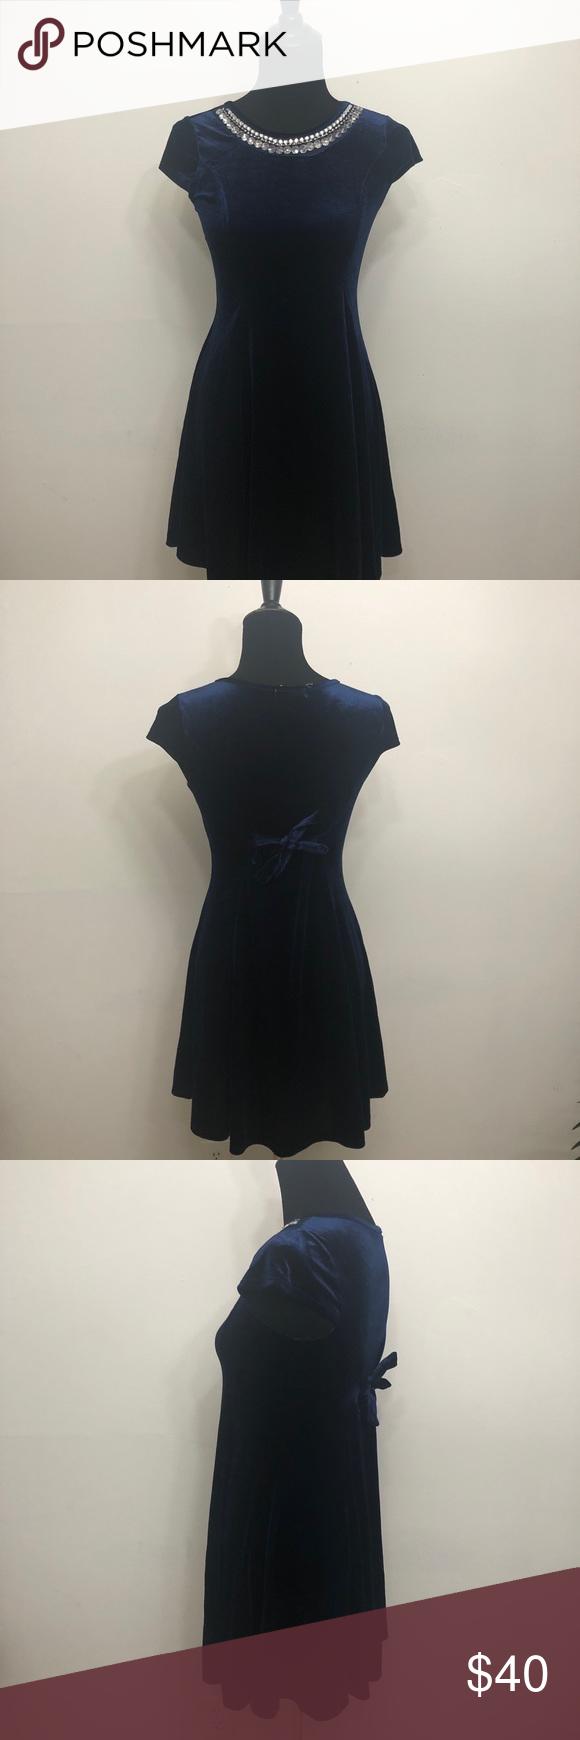 432818651 Ten Sixty Sherman Girls Velvet Necklace Dress Velvet Necklace Dress ...